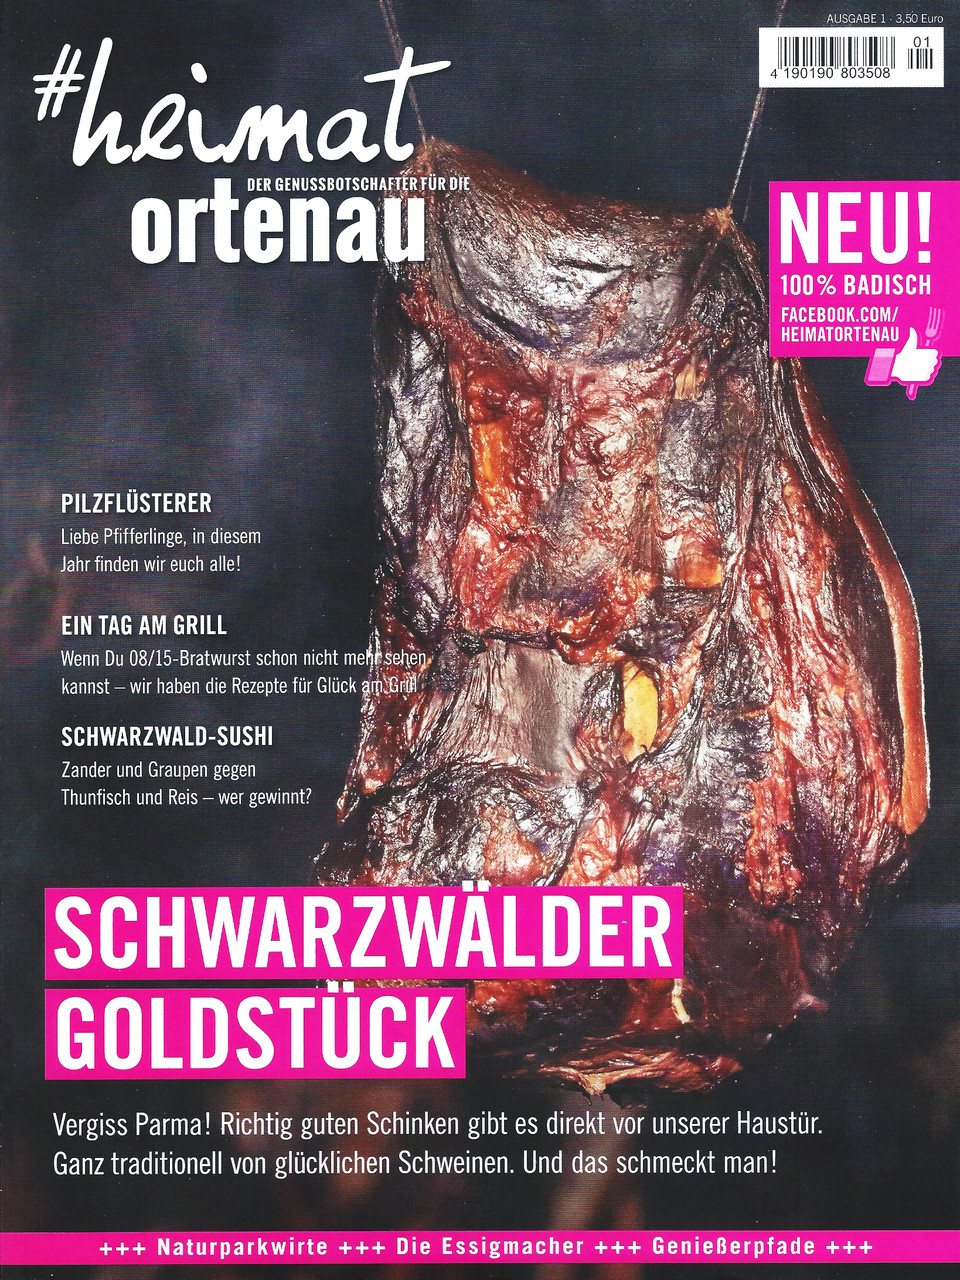 heimat Ortenau - Ausgabe 1/2015